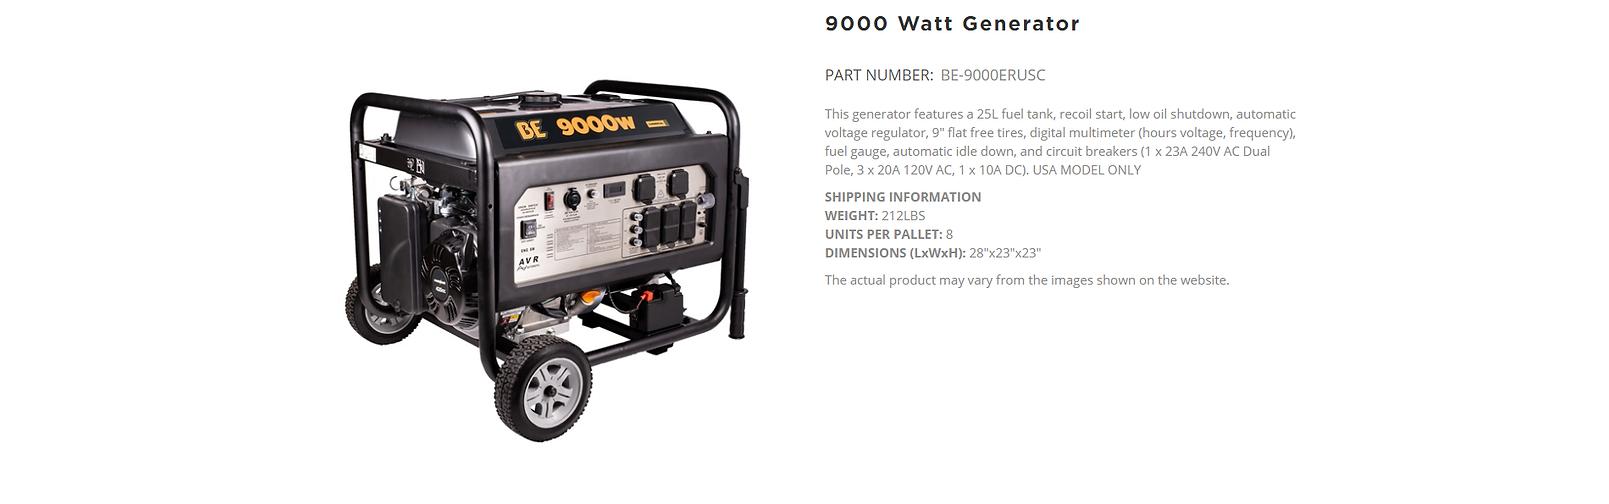 Generator 9000W.png